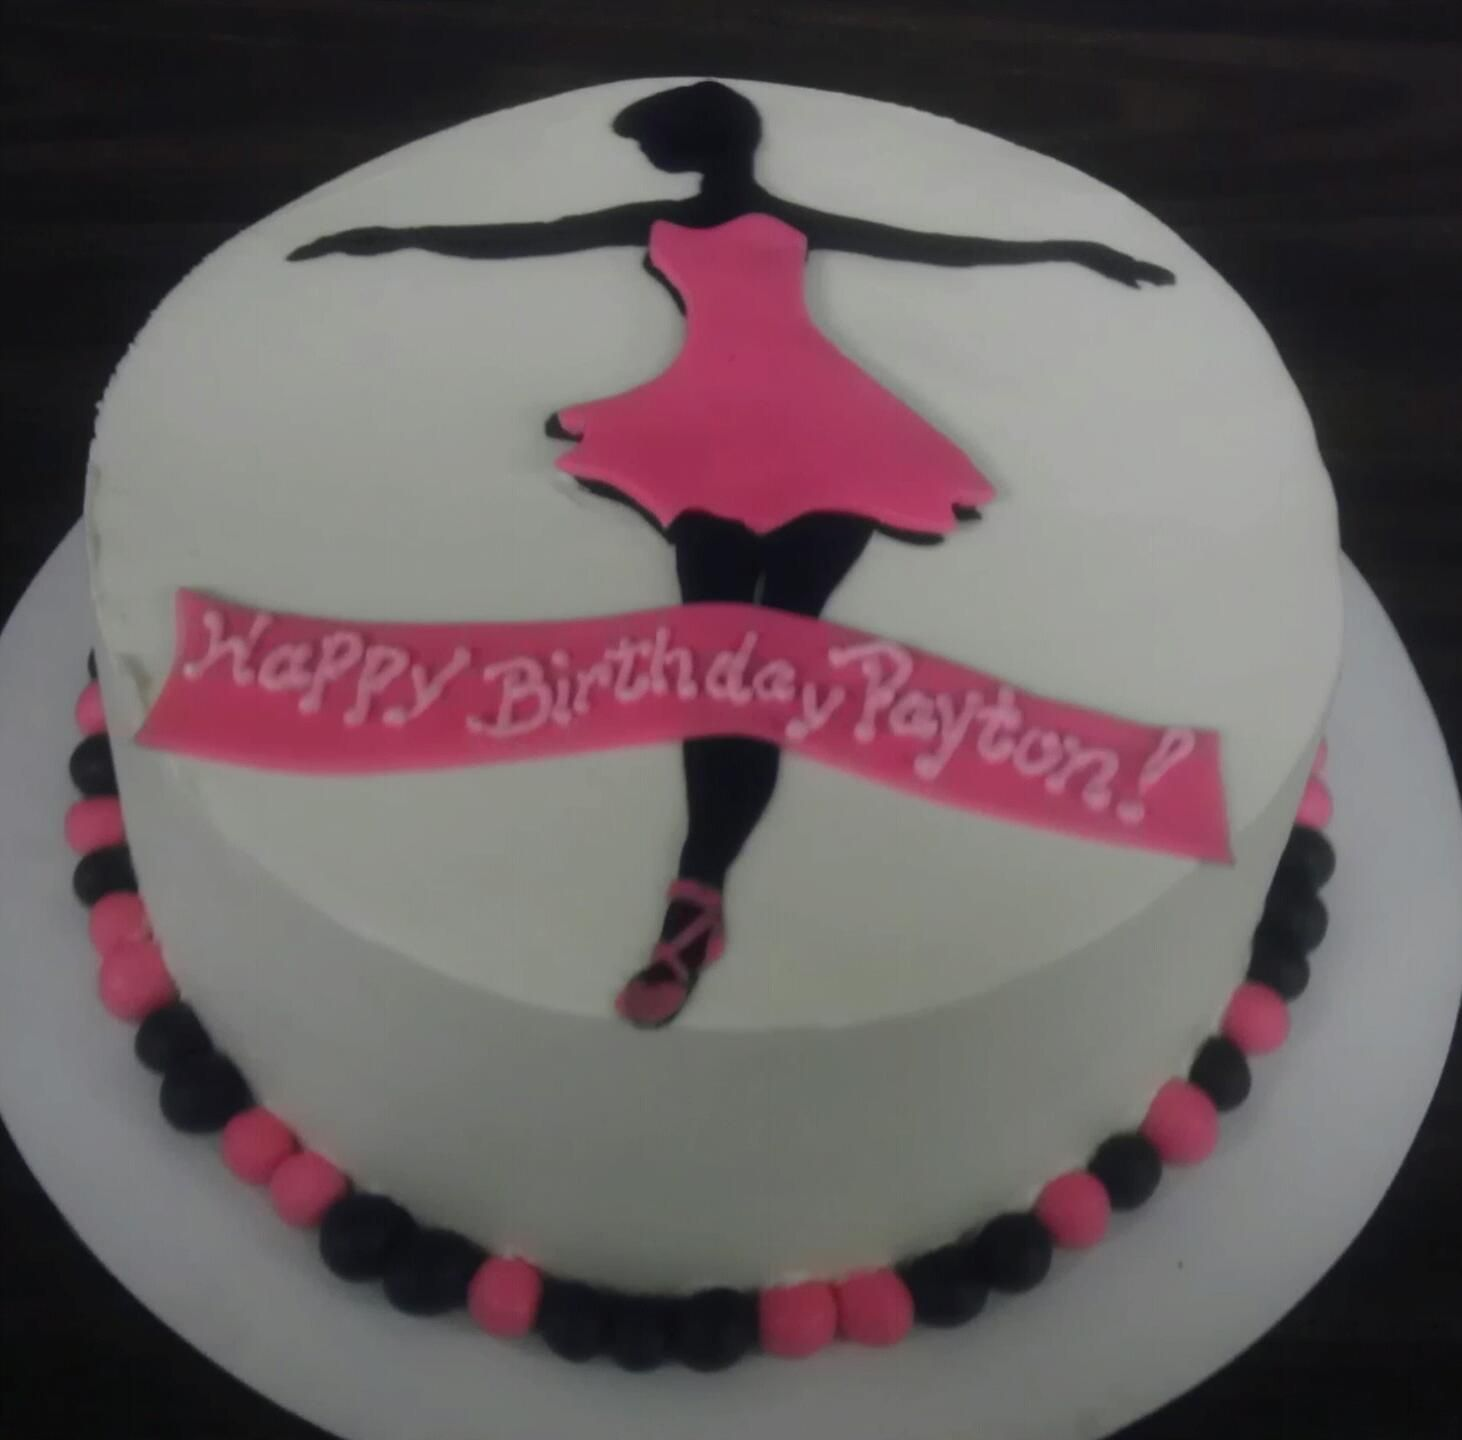 Ballerina Gluten Free Cake By Hag Atlanta GA